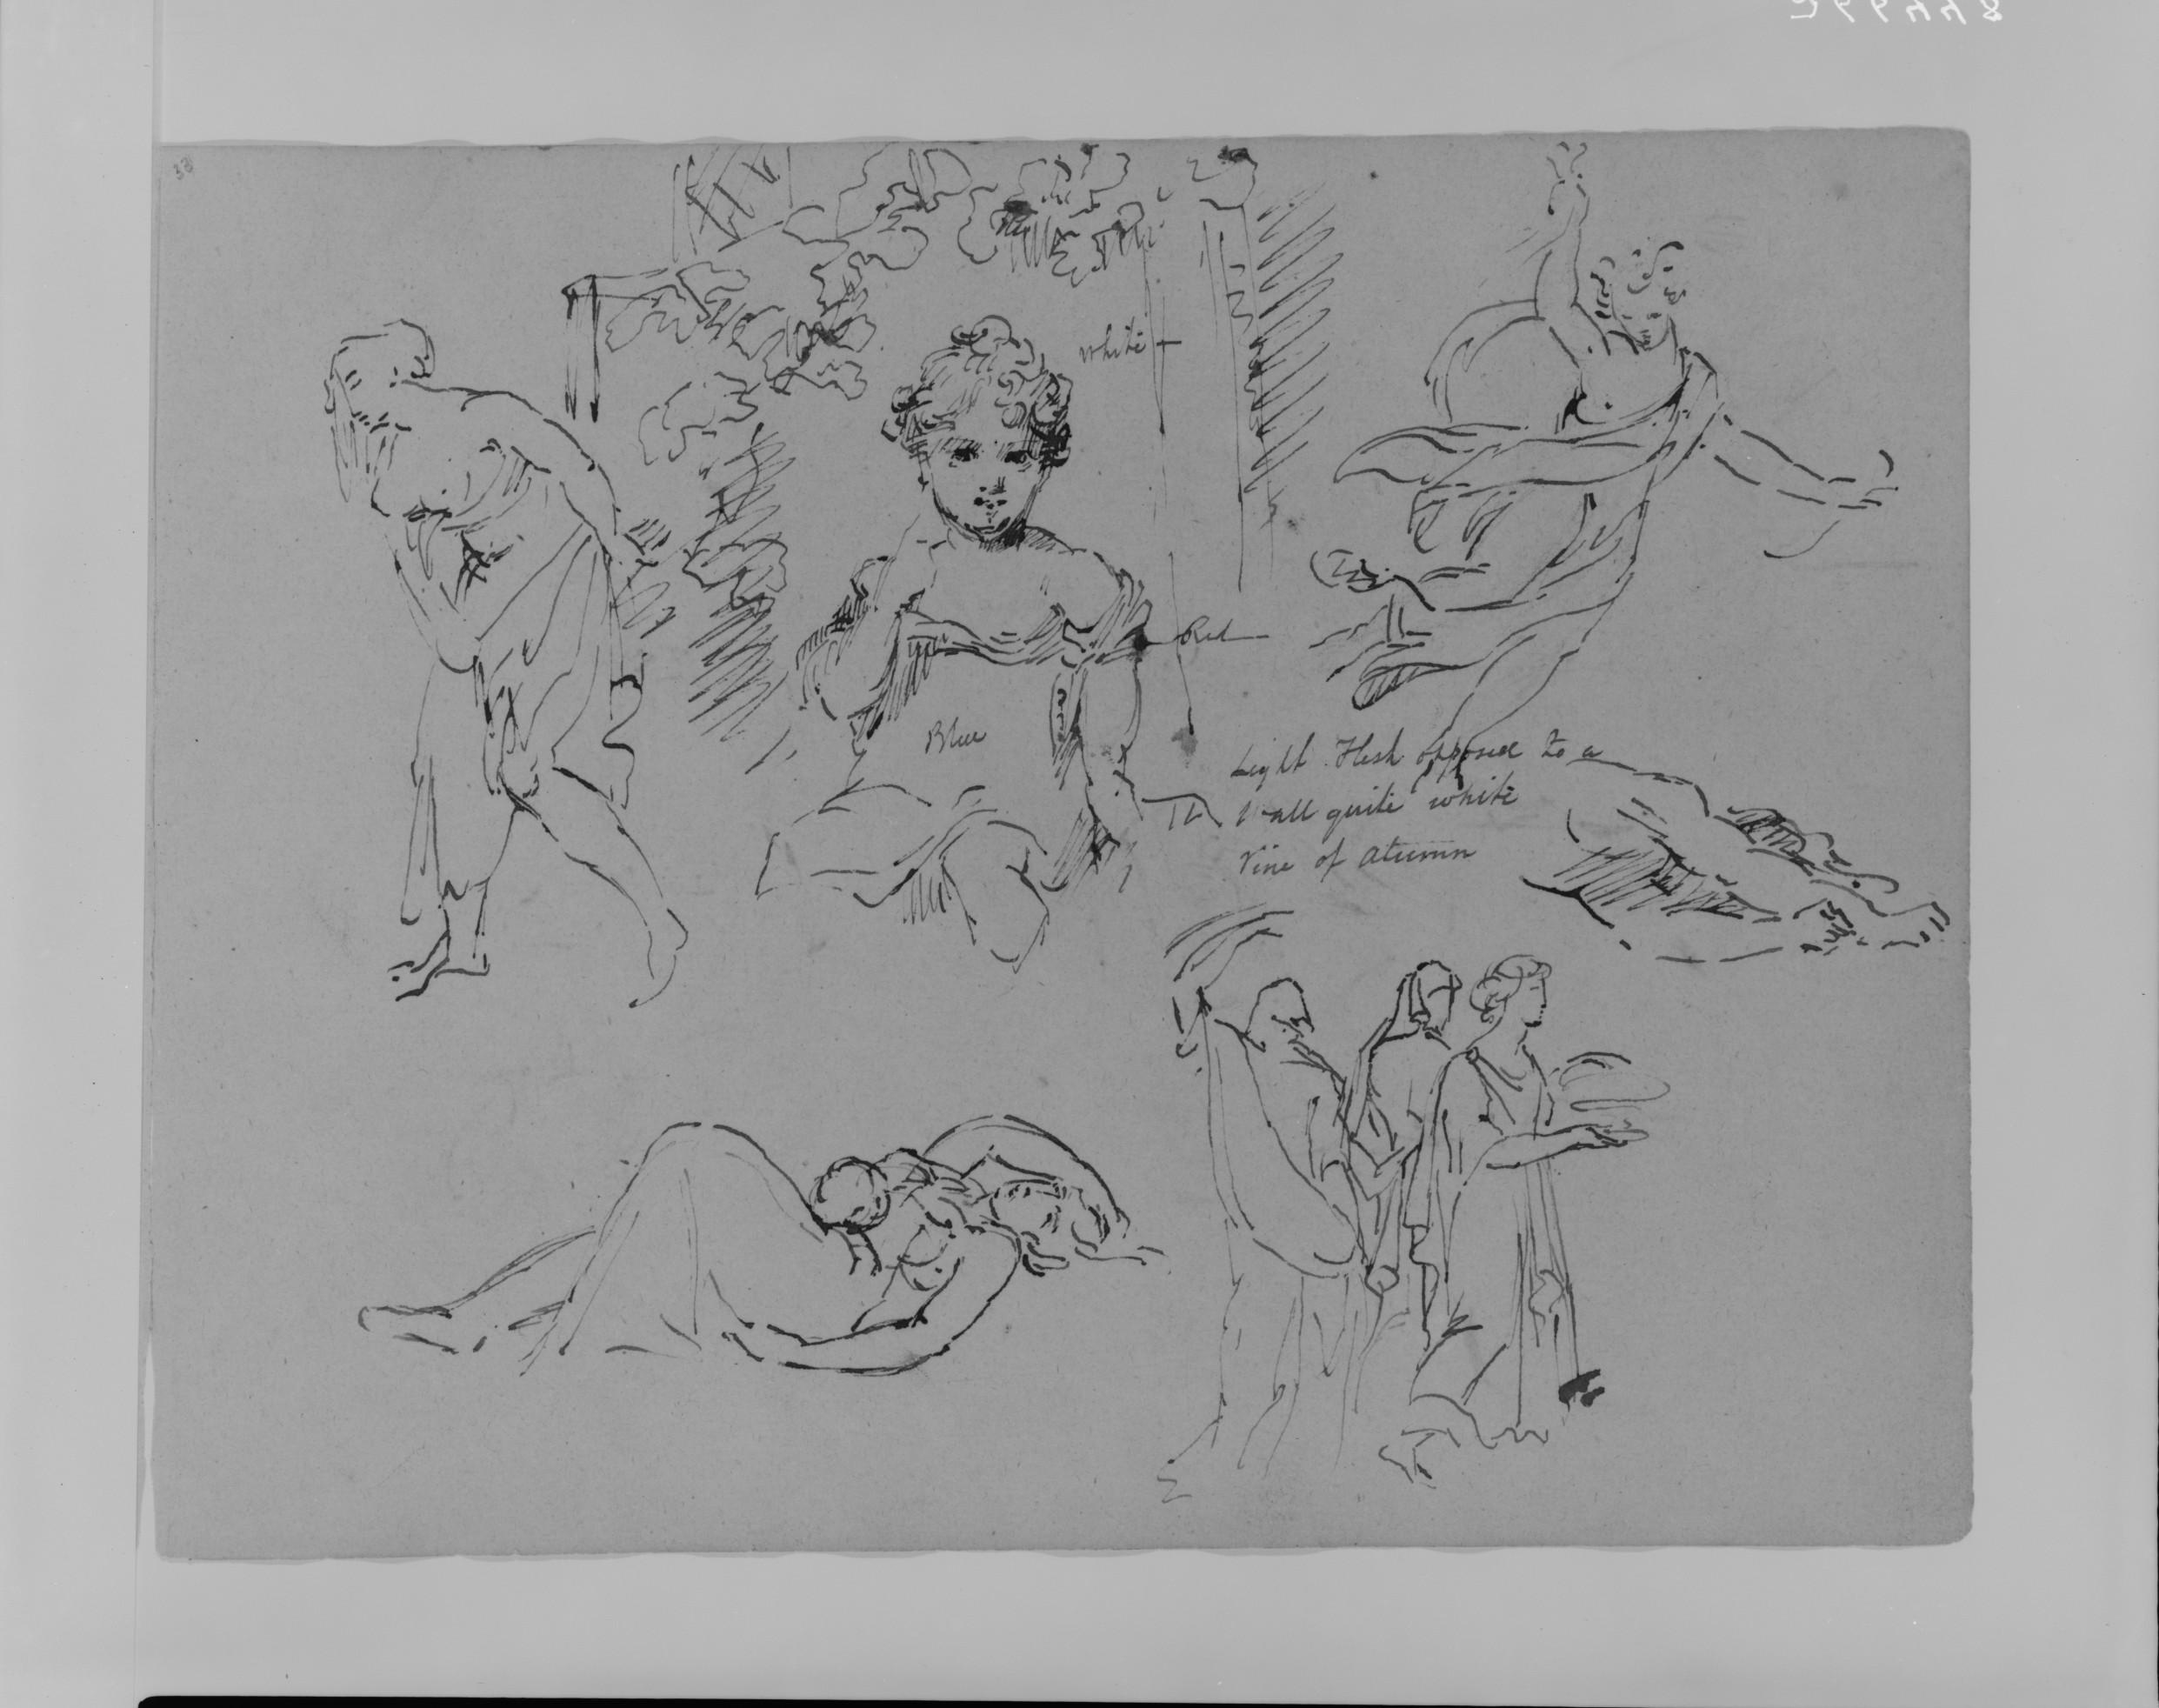 Flower Child Line Drawing : File portrait of girl in flower bower walking draped female